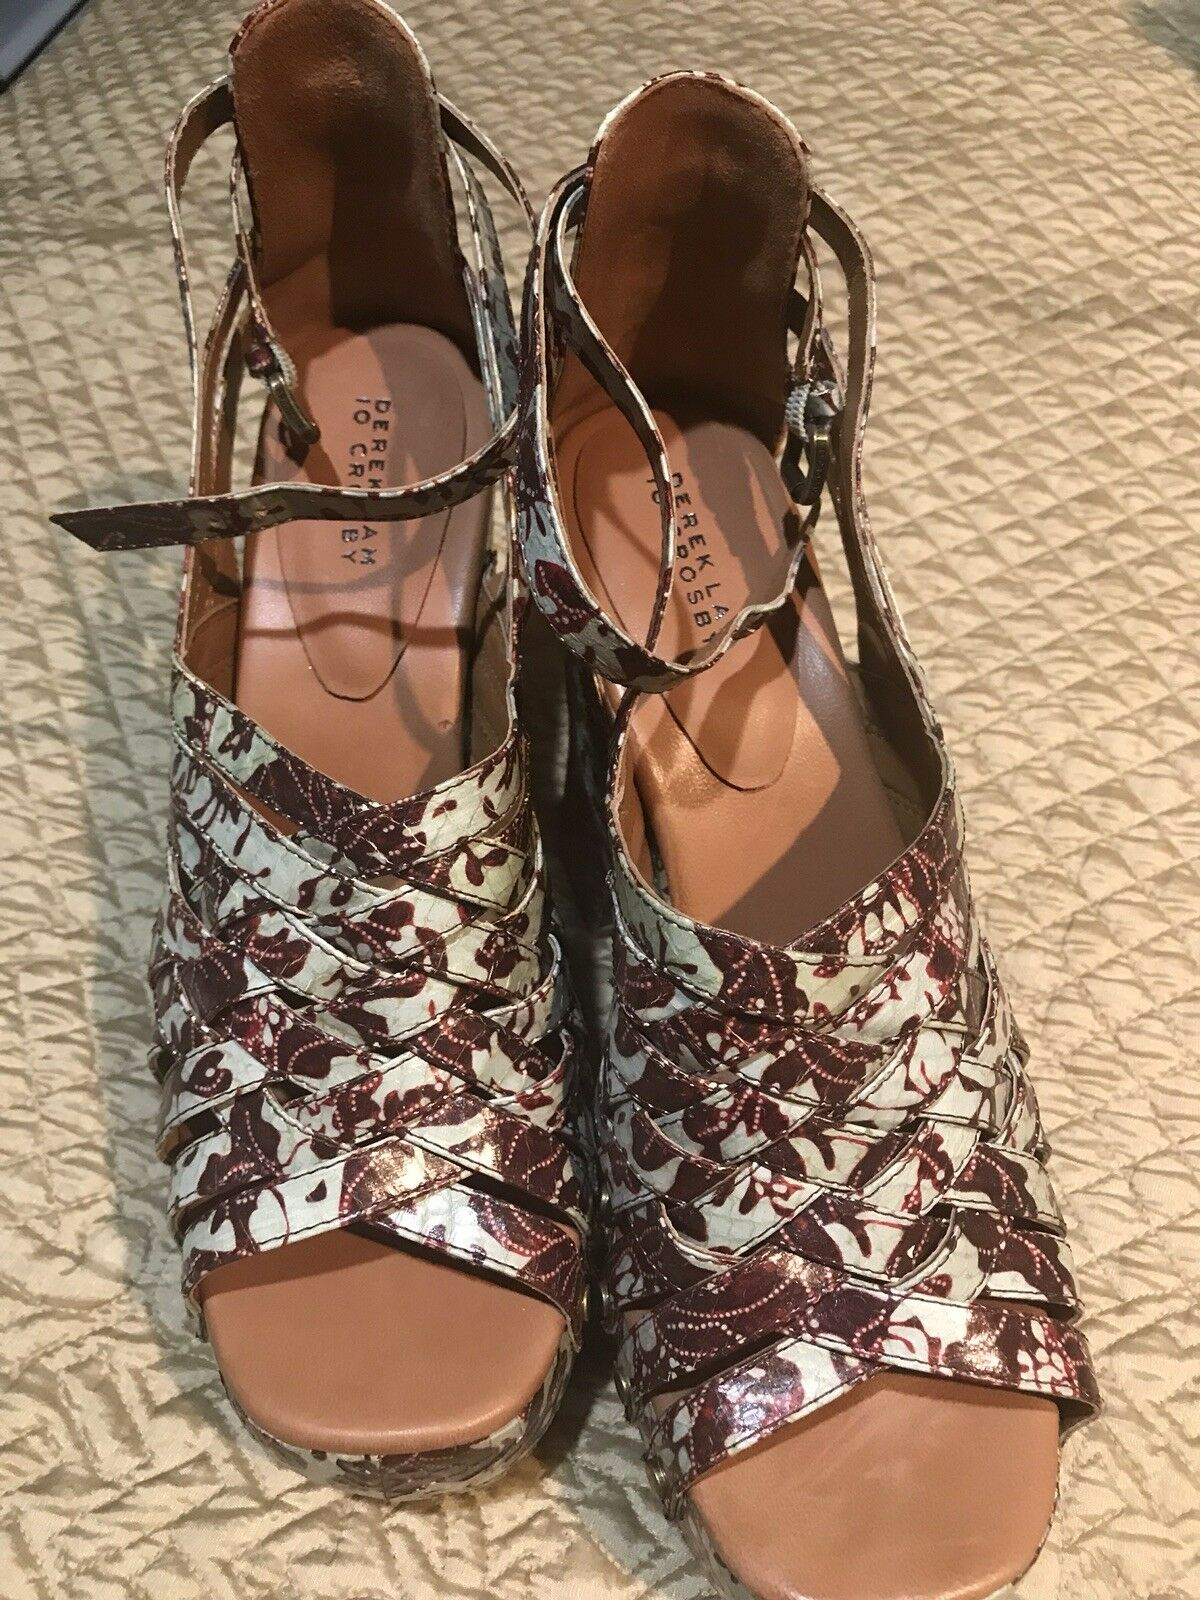 Derek Lam Donna Snake light Skin Shoes light Snake green with burgundy flowers size 9.5 f200ac